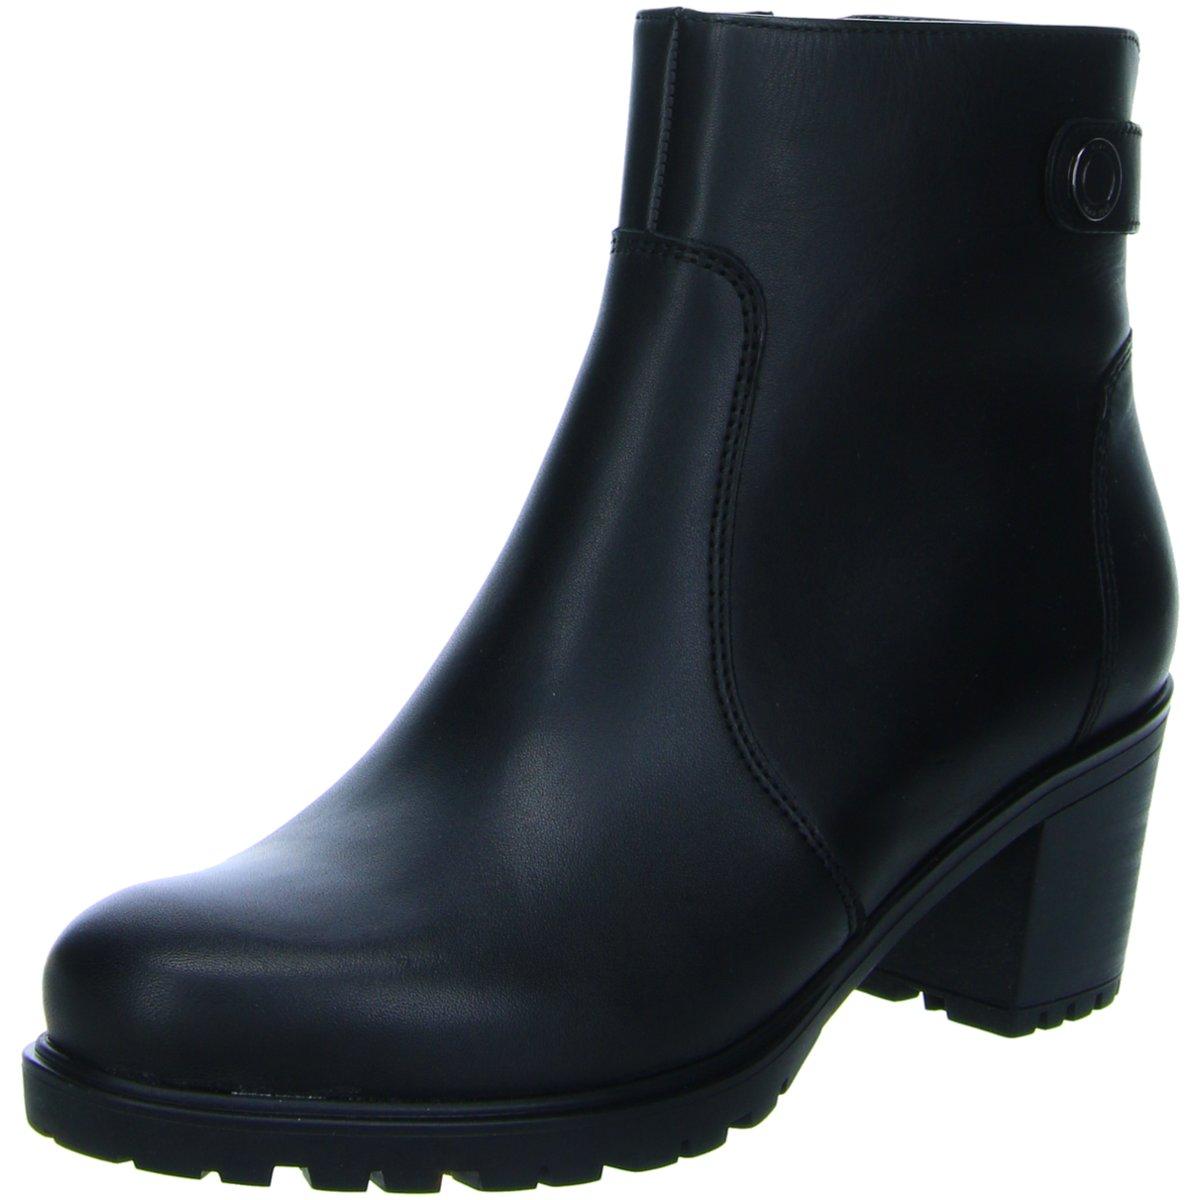 Ara Damen Stiefeletten Mantova -G- 12.47331.60 schwarz 391789